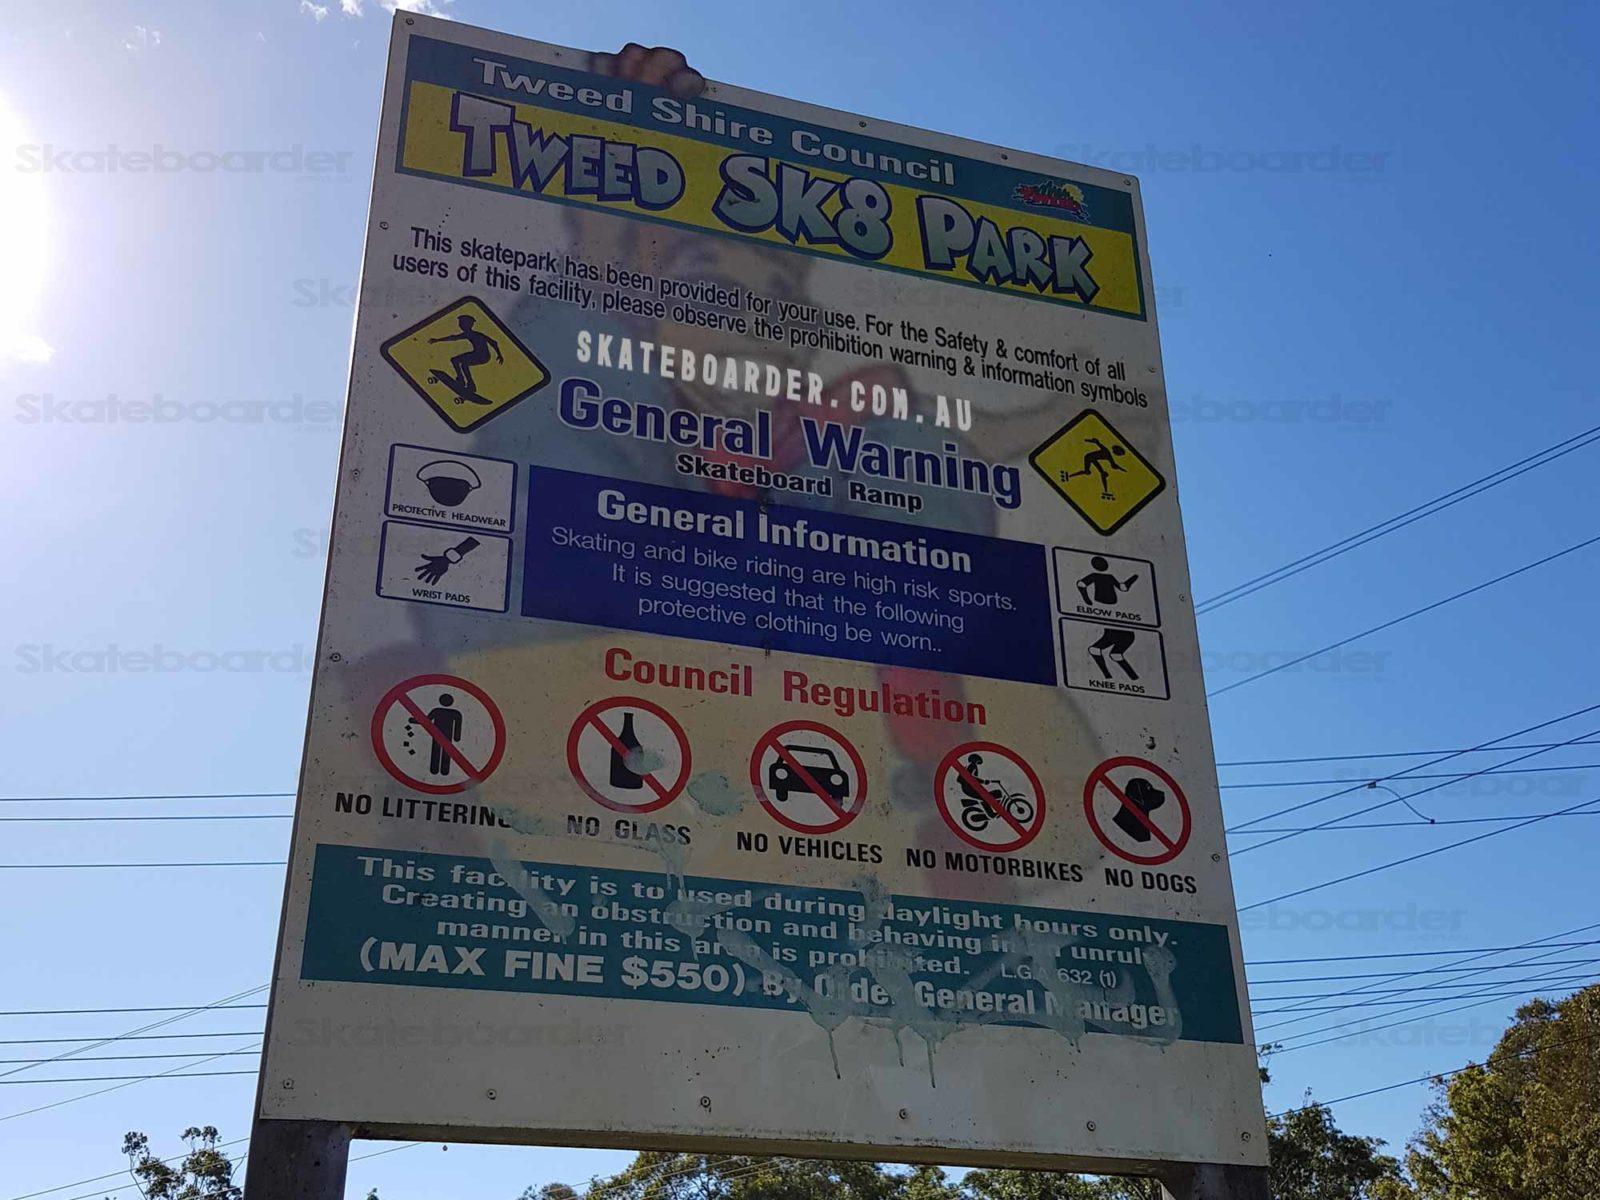 Tweed Sk8 Park Sign